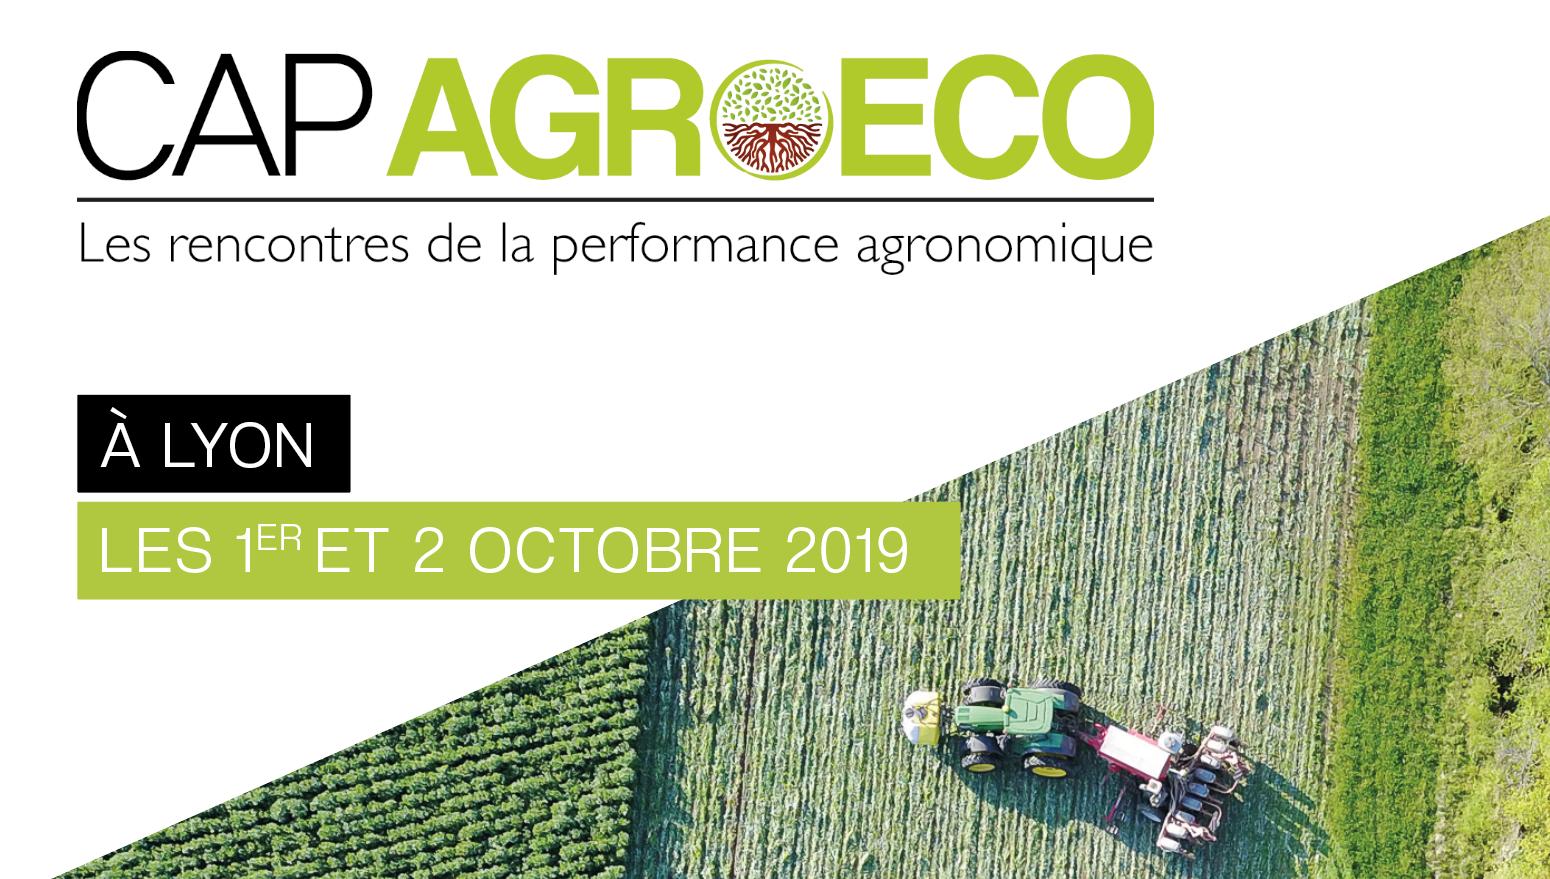 Cap-agroeco-1-et-2-octobre-2019